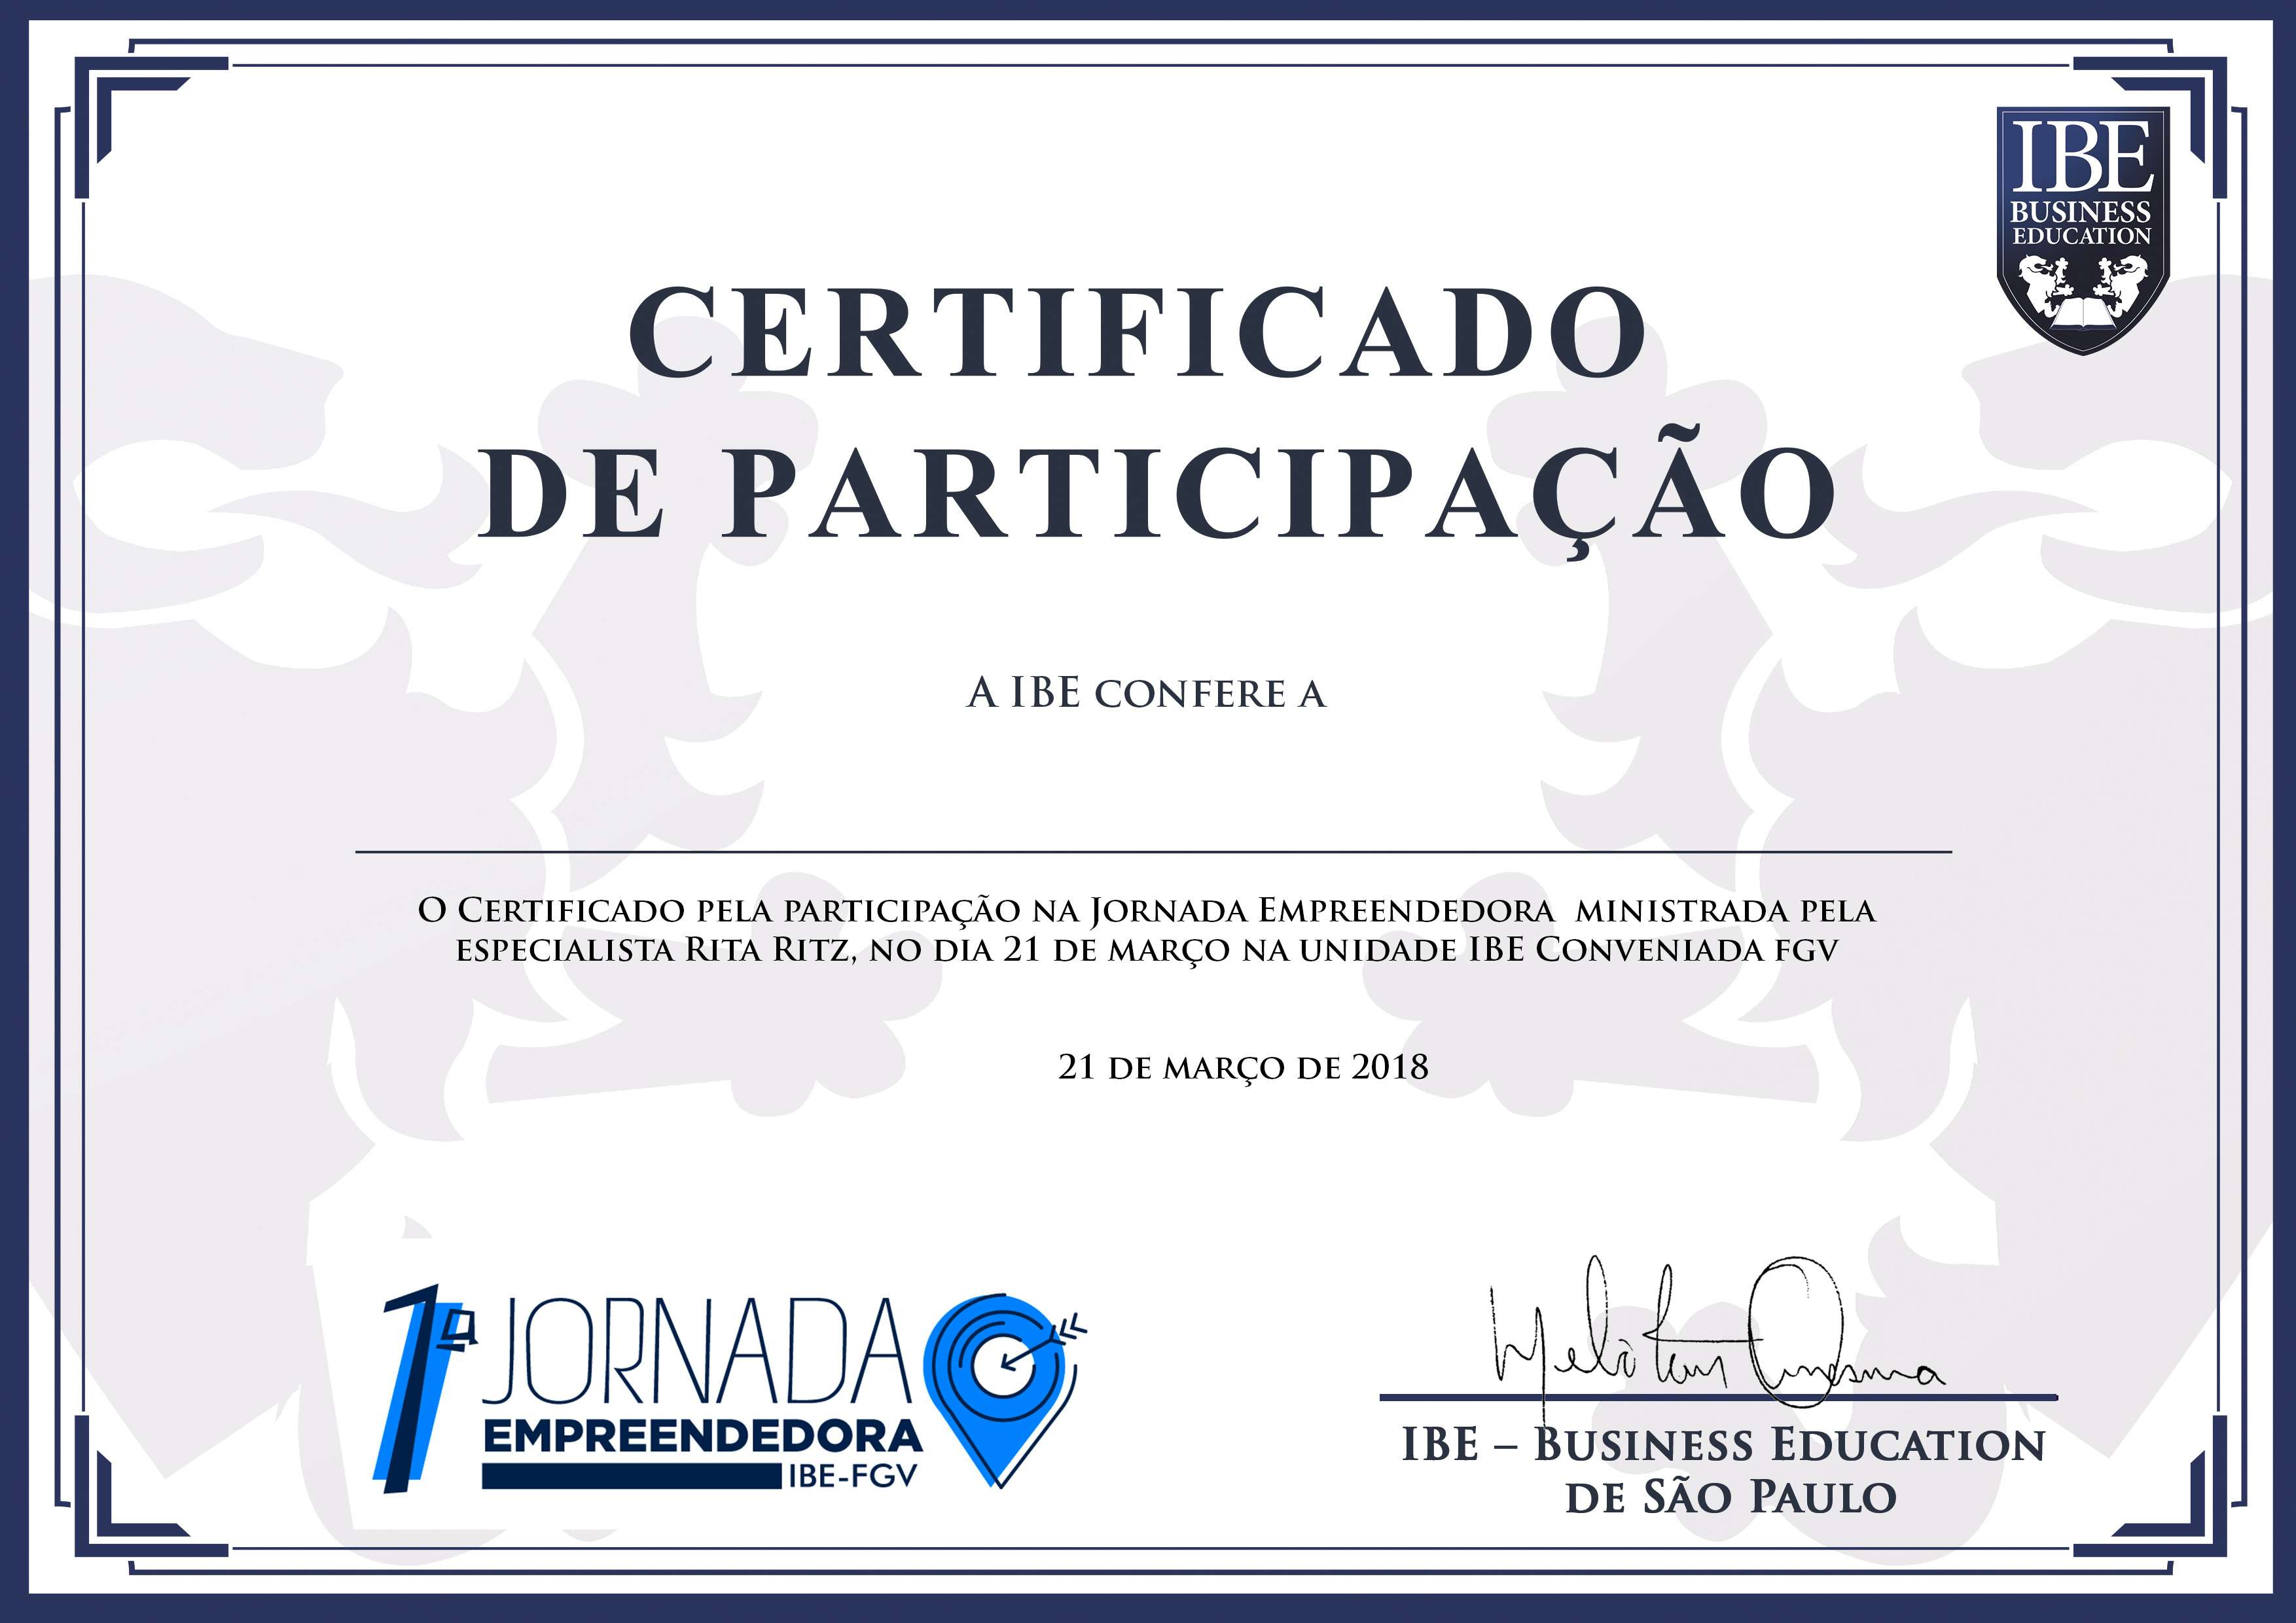 certificado-americana-1.jpg